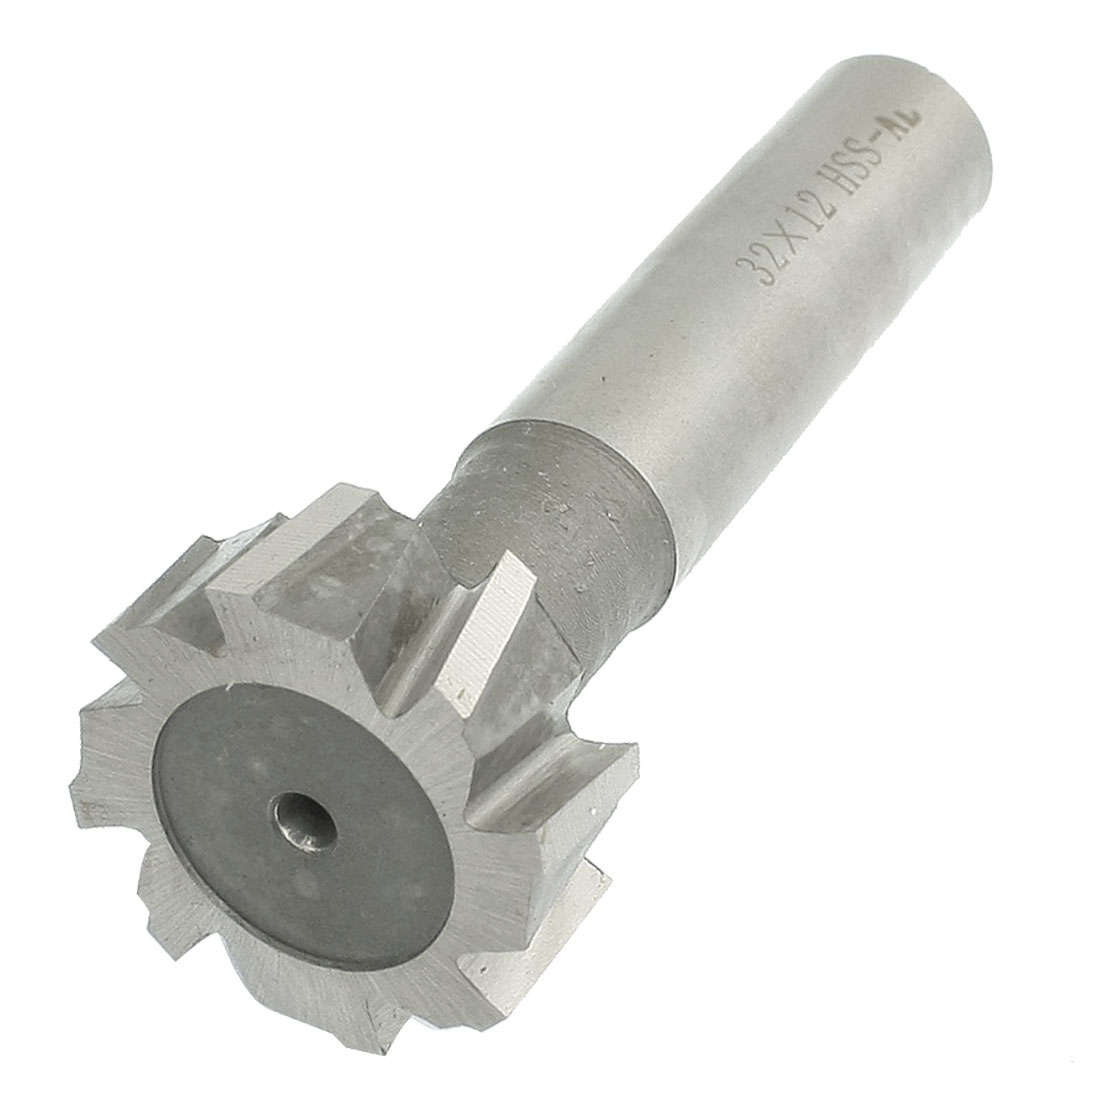 "Handy Tool 1 7/25"" x 15/32"" HSS 8 Flutes T Slot Milling Cutter"